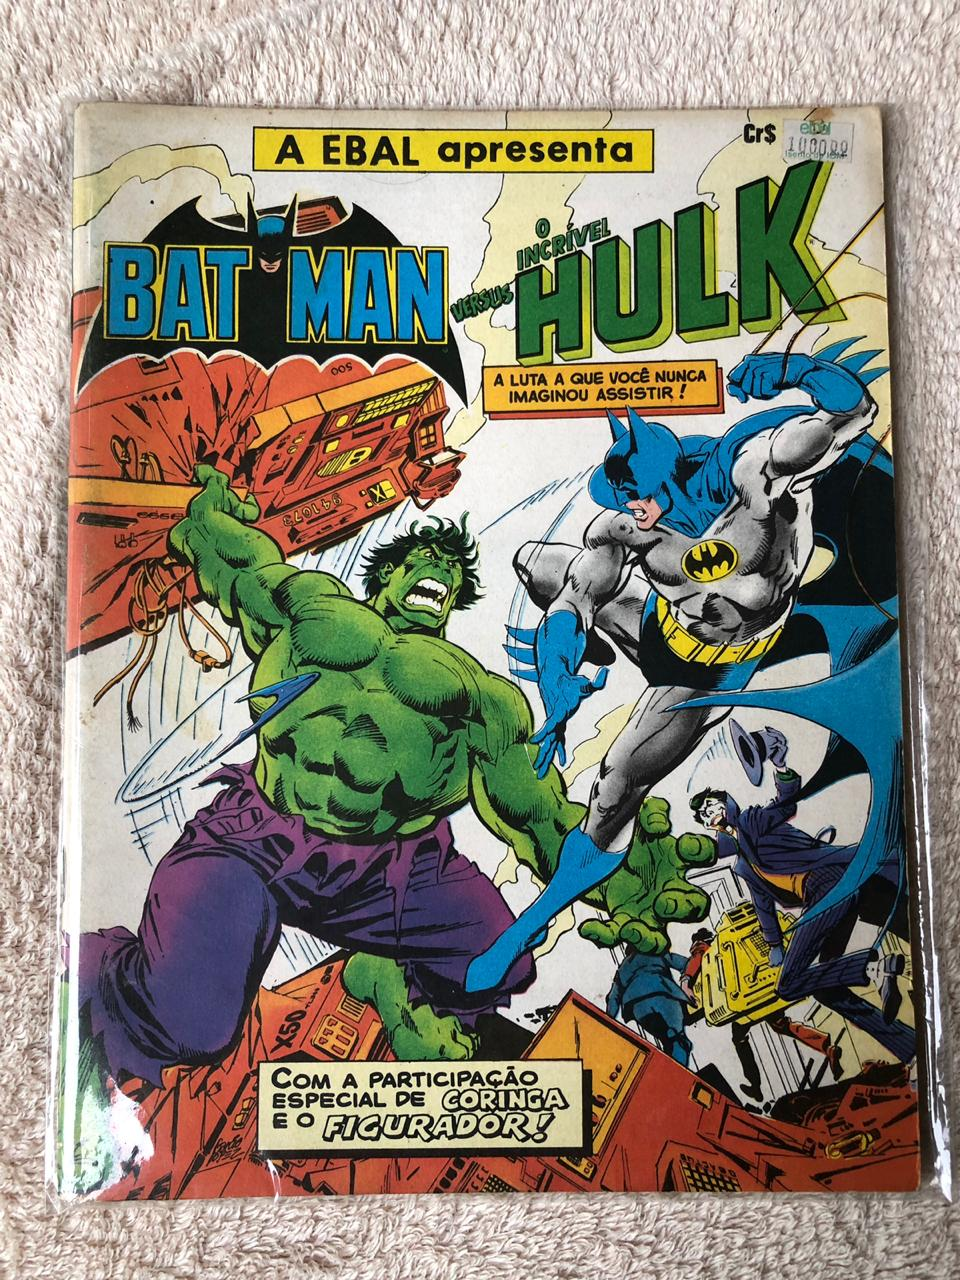 6° lote - Batman versus Hulk (Ed. Ebal)